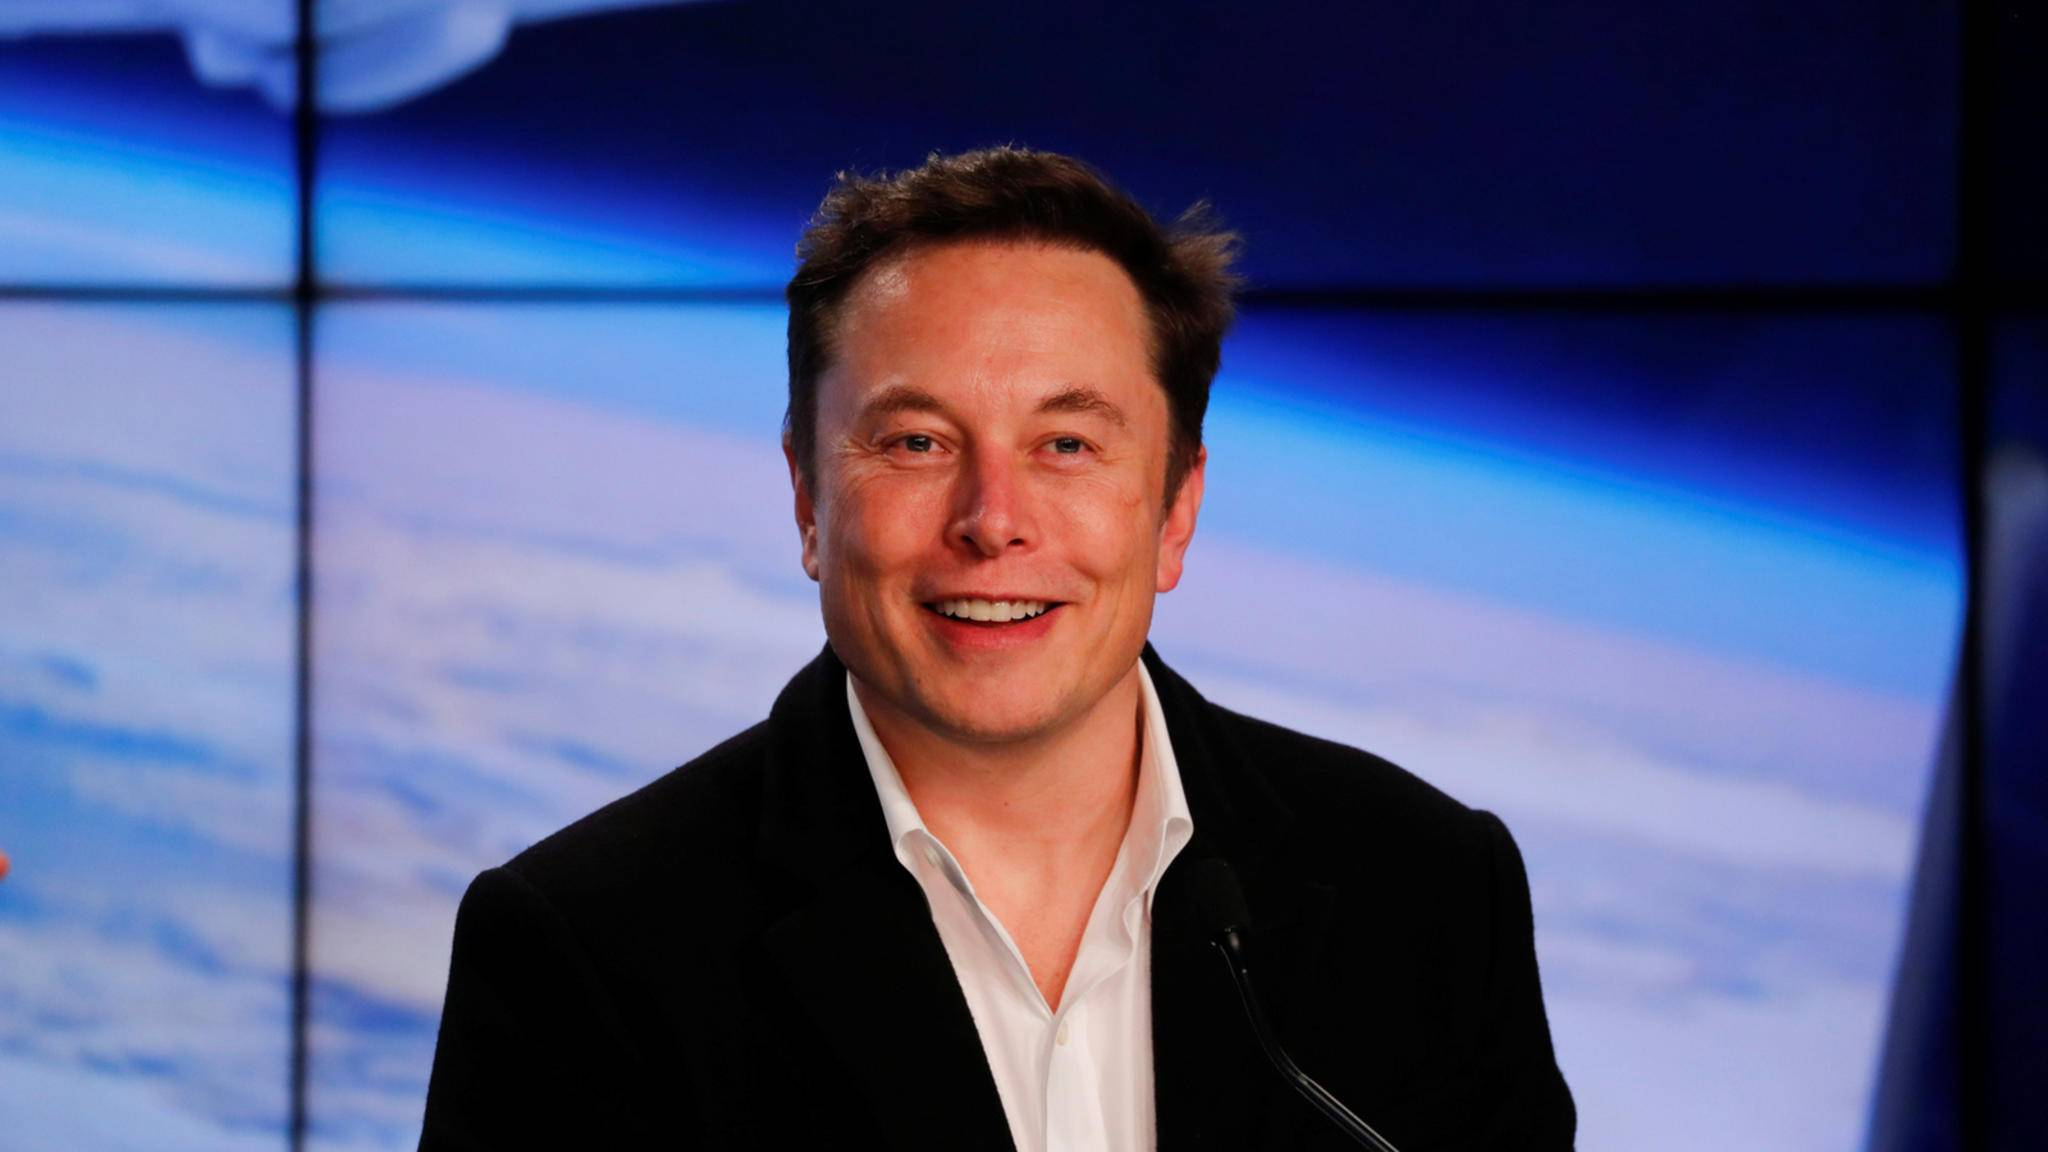 Elon Musk tüftelt an einer neuen Idee.